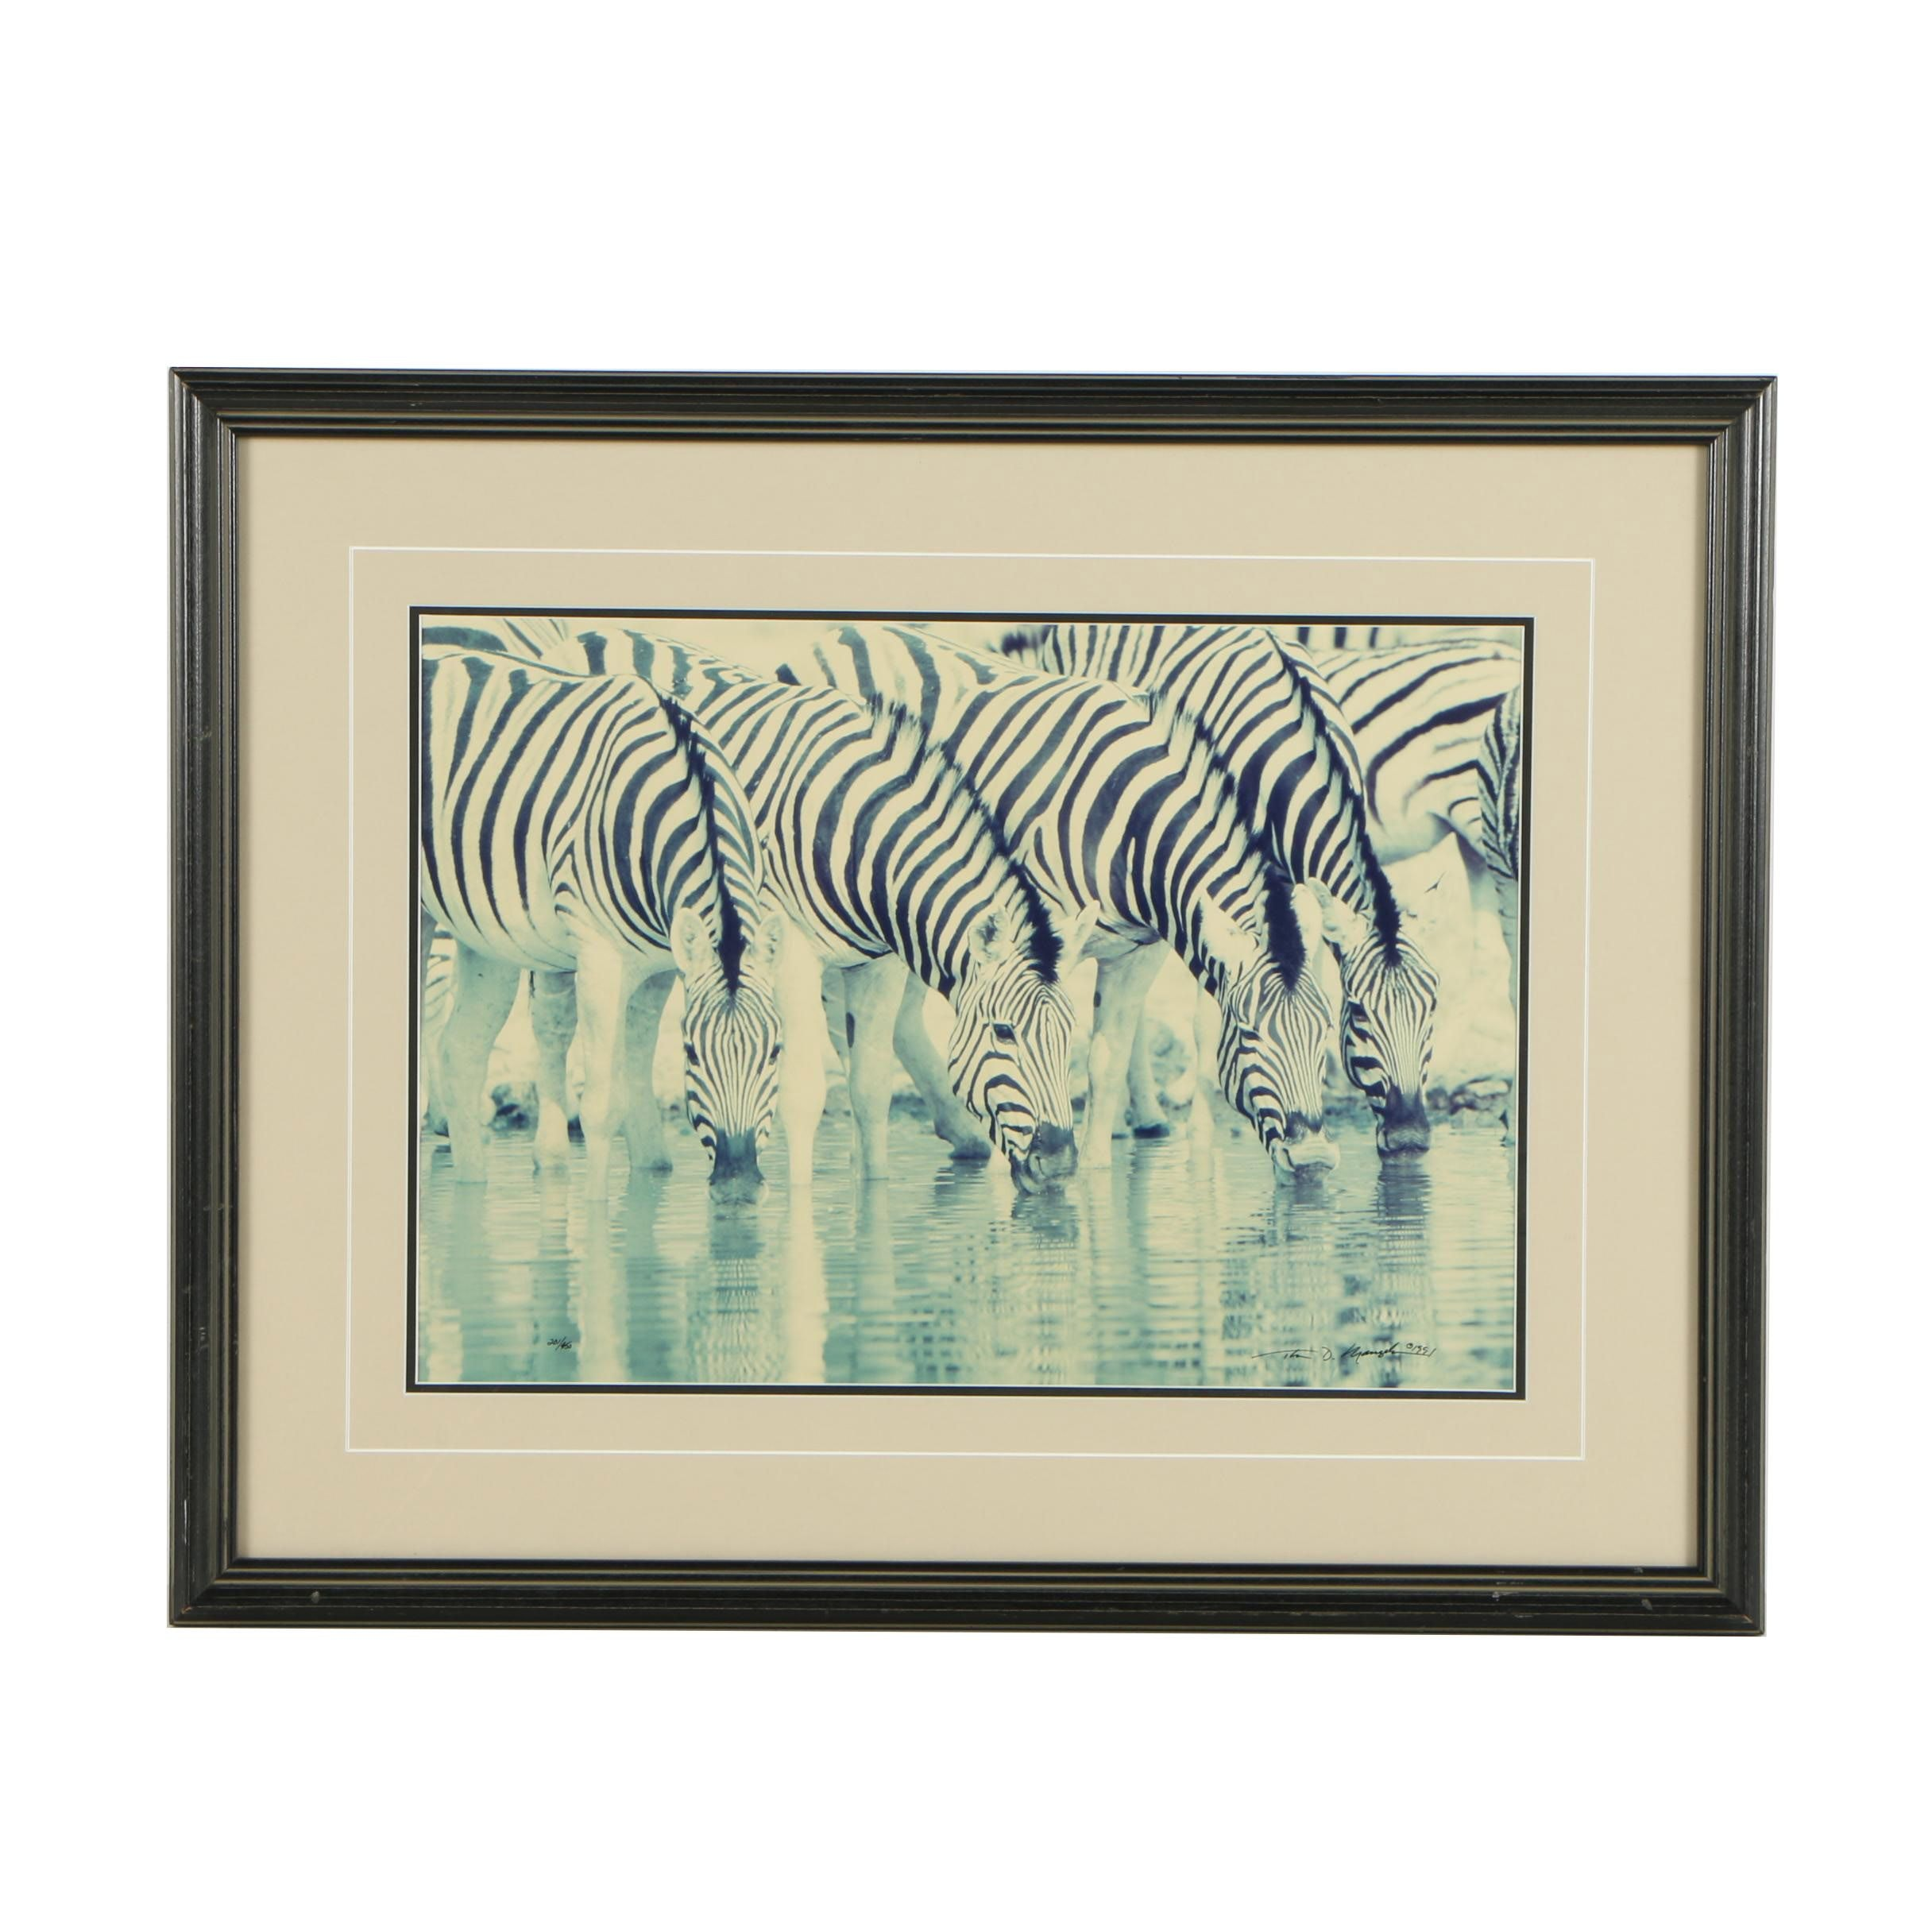 "Thomas D. Mangelson Color Photograph ""The Dry Season - Zebras"""